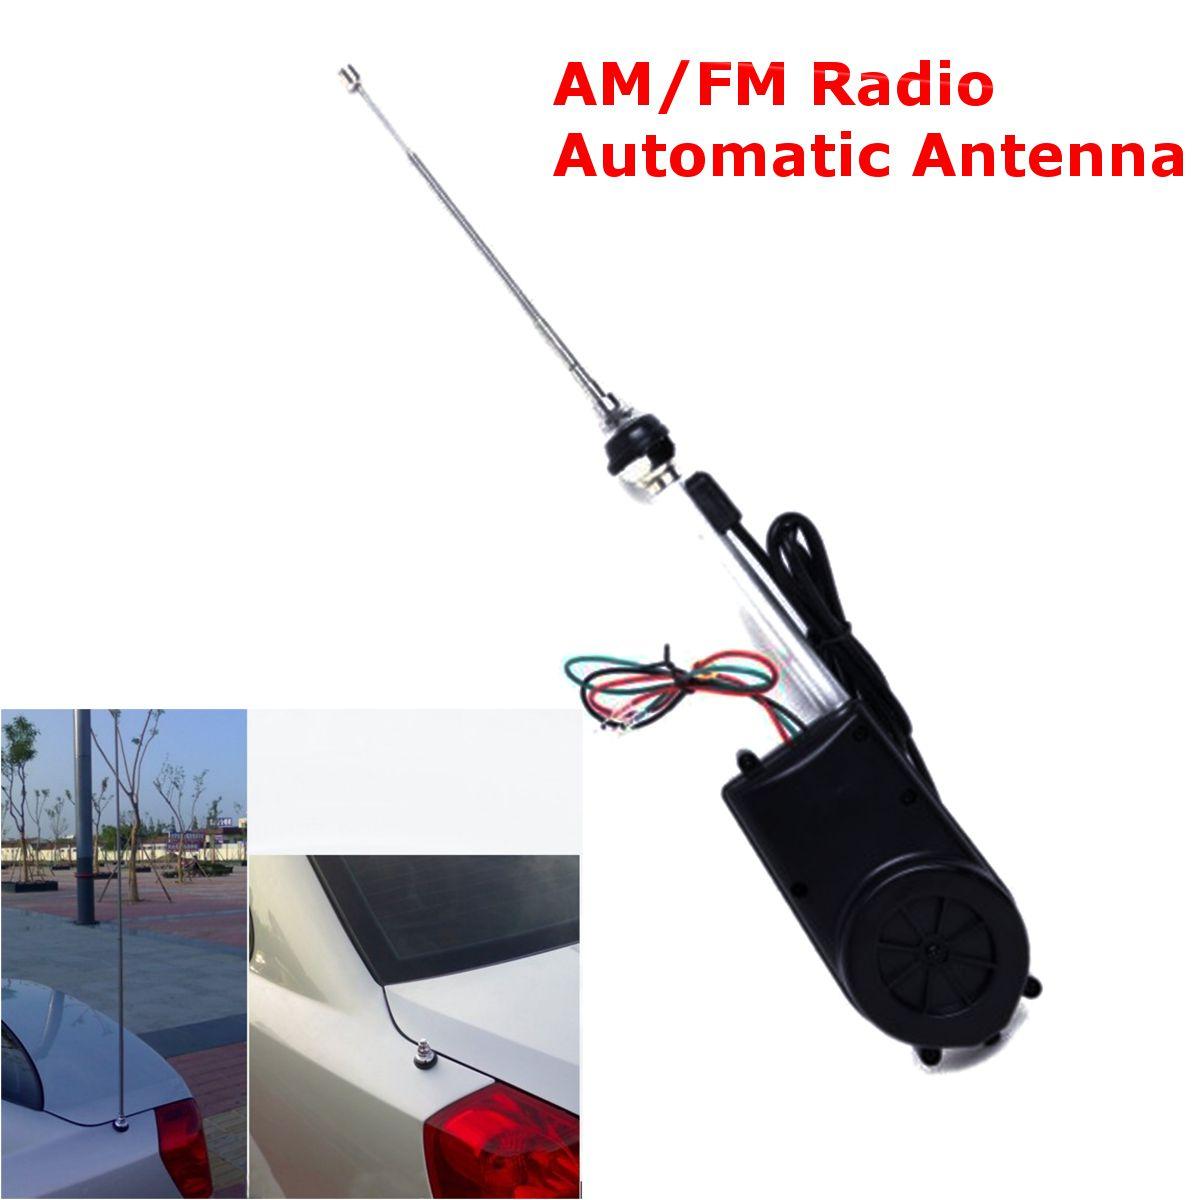 Car AM/FM Van Electric Power Radio Antenna Conversion Unit Car Electric Aerial Radio Automatic Booster Power Antenna Kit